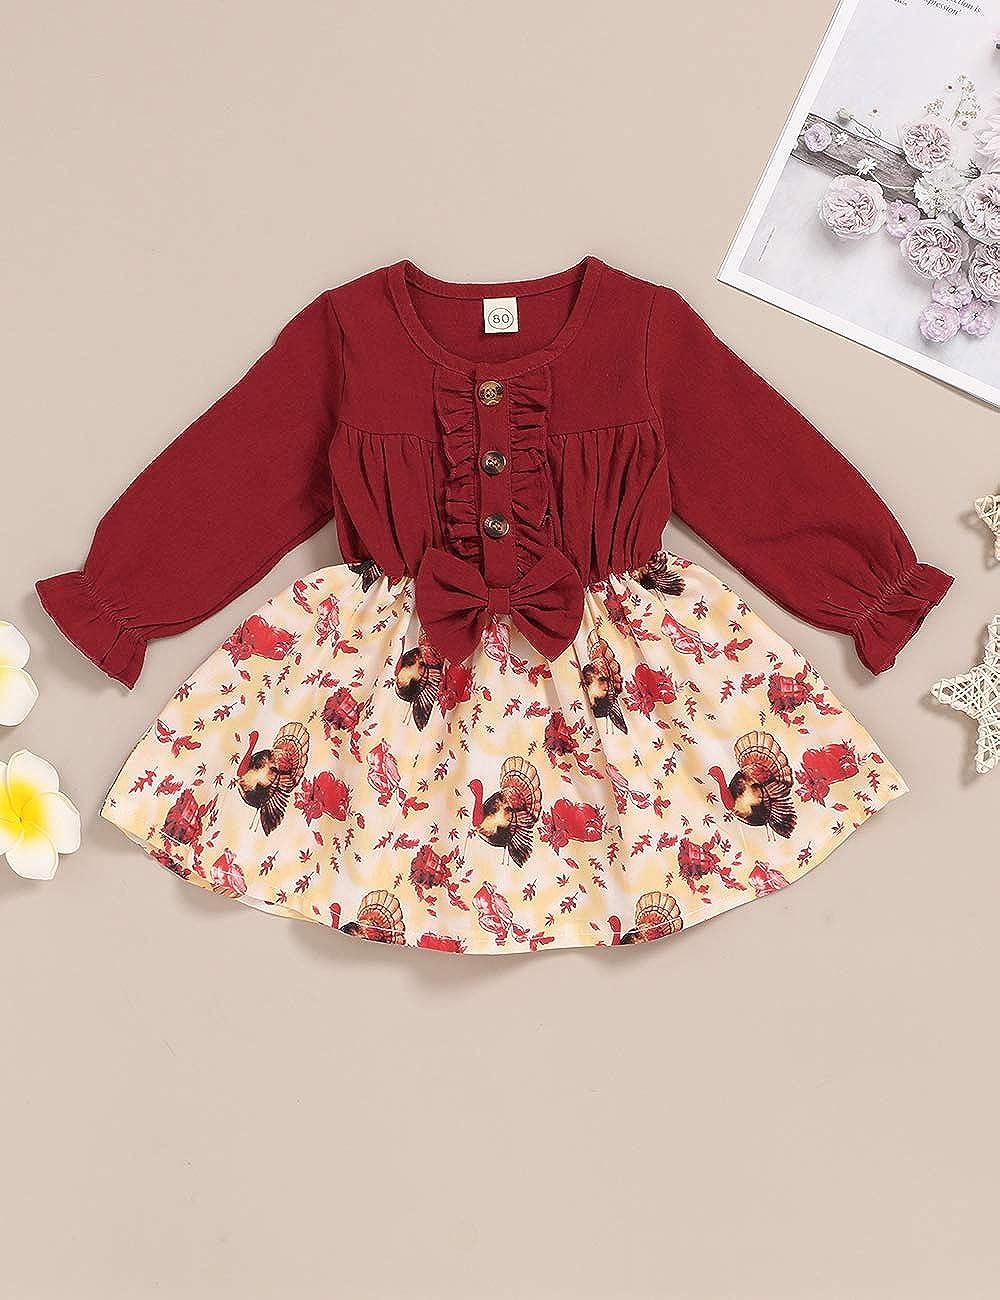 itkidboy Toddler Infant Baby Girl Ruffled Denim Long Sleeve Dress Princess Skirt Tutu Summer Clothes Outfits